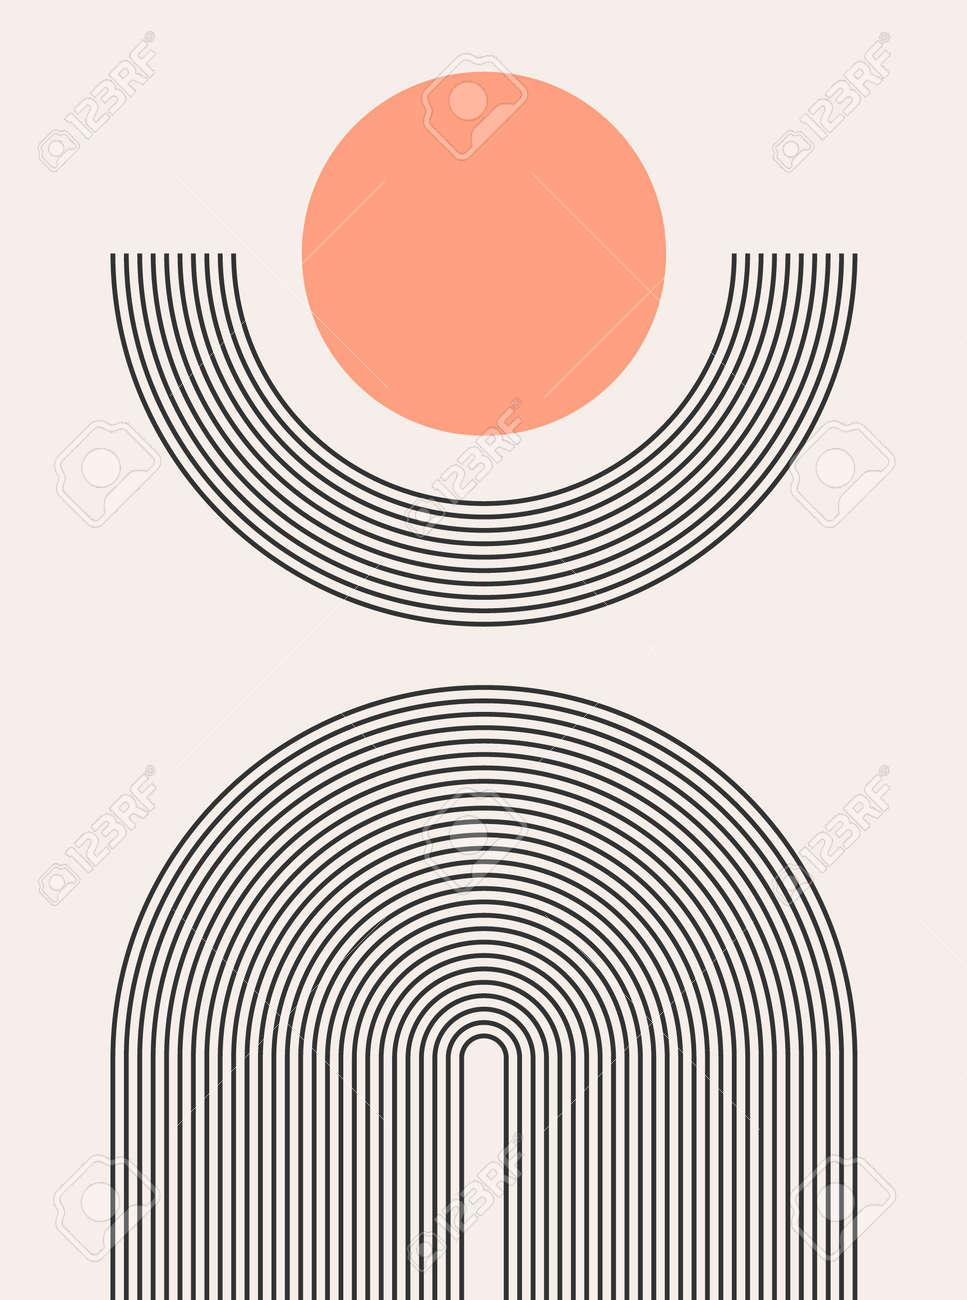 Abstract modern bohemian contemporary geometric minimal pattern art style. Wall line boho abstract shape arch - 168952909